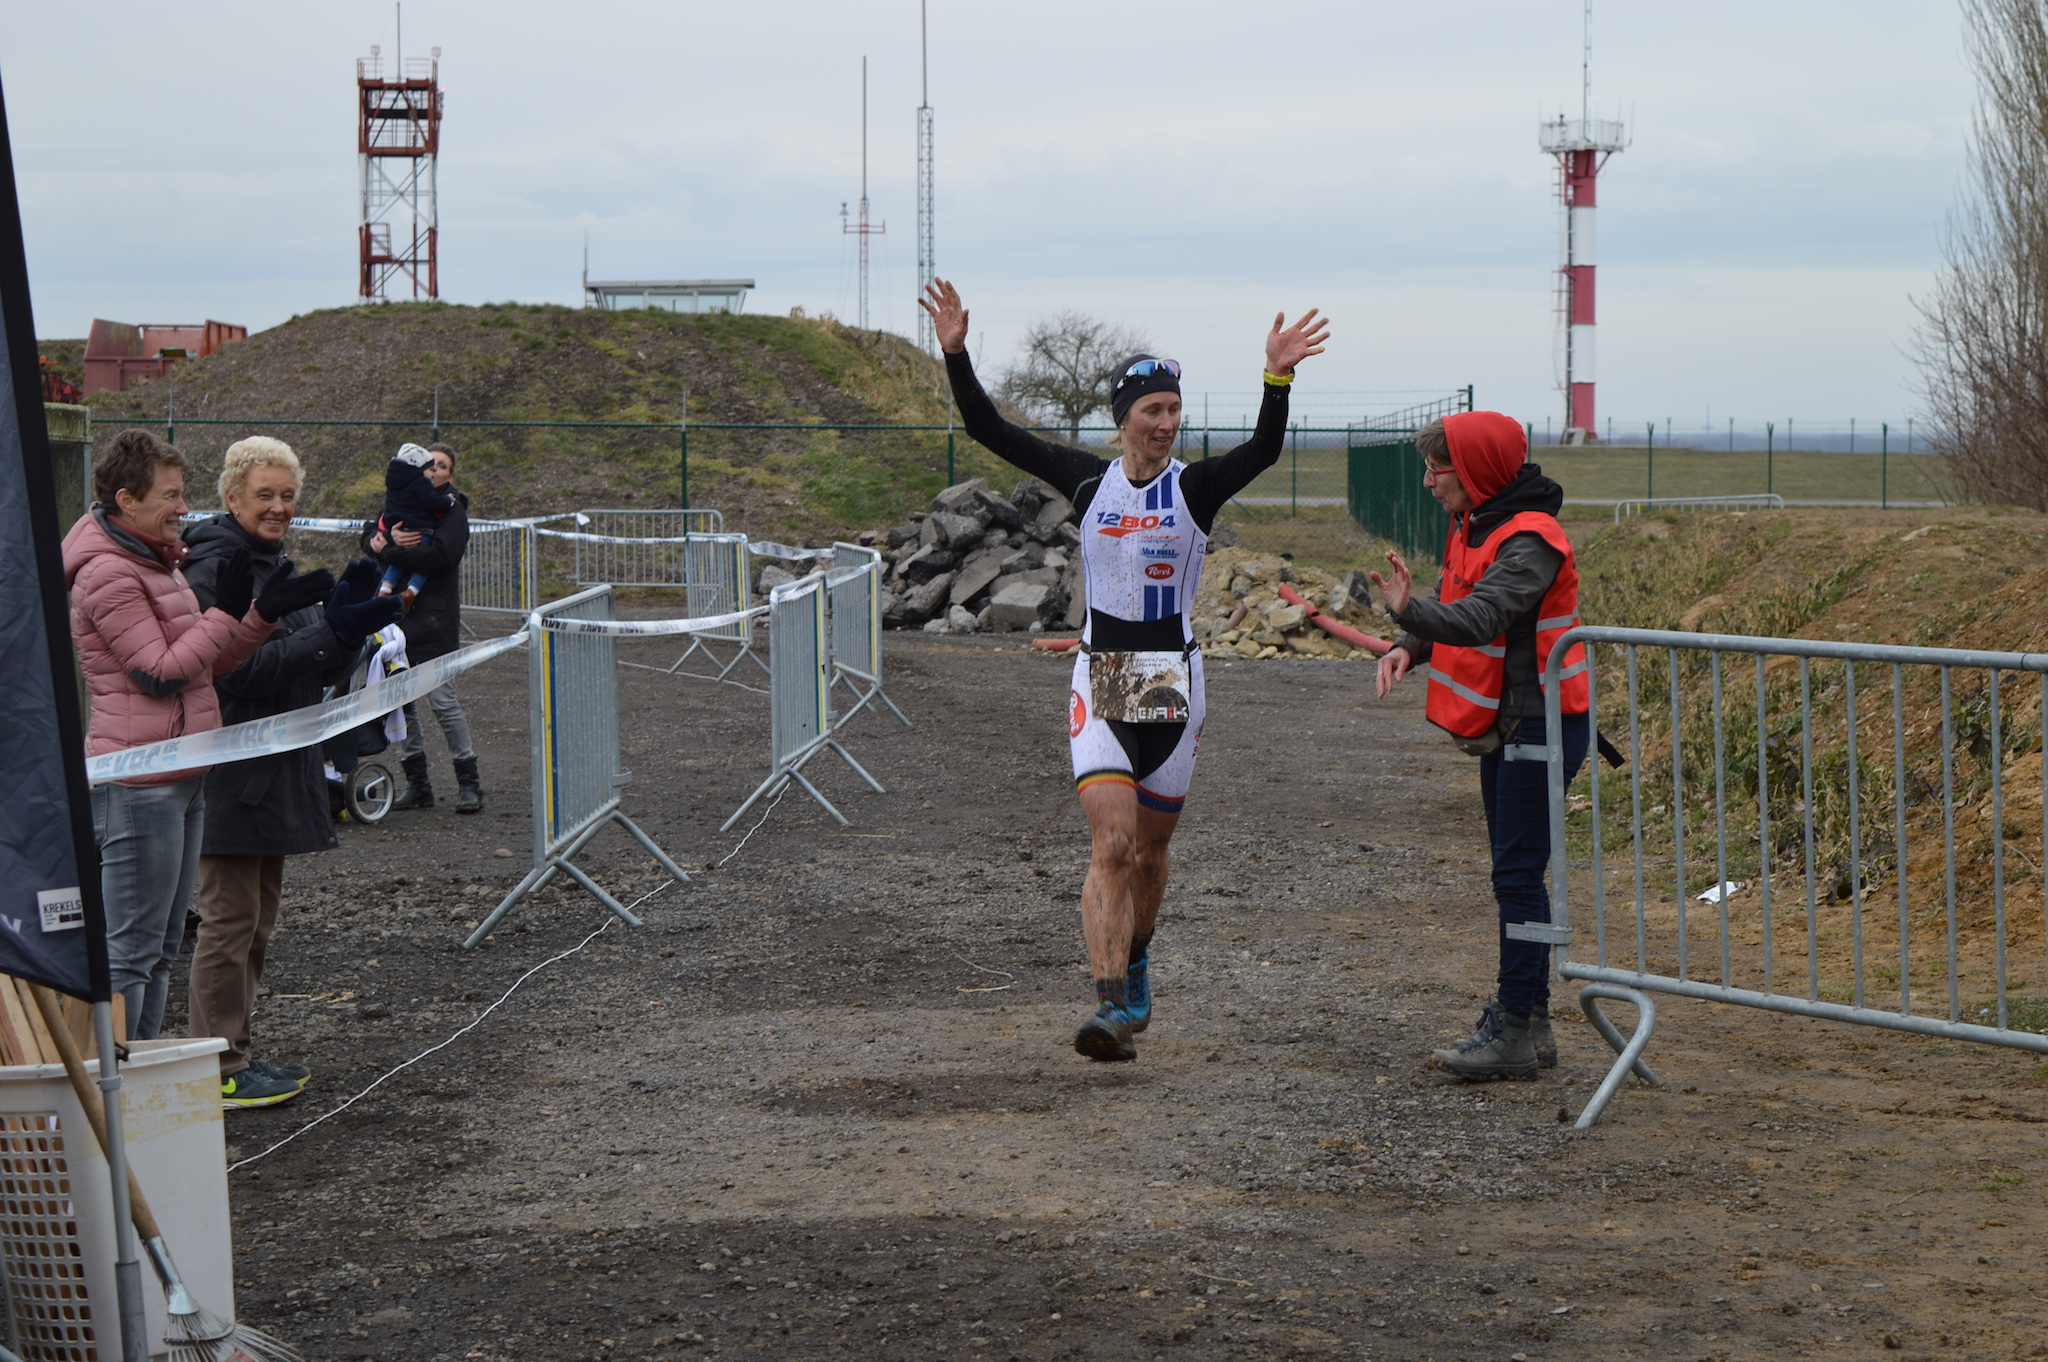 Inge Roelandt wint de BAIK X-duathlon 2018 (foto: 3athlon.be/Hans Cleemput)